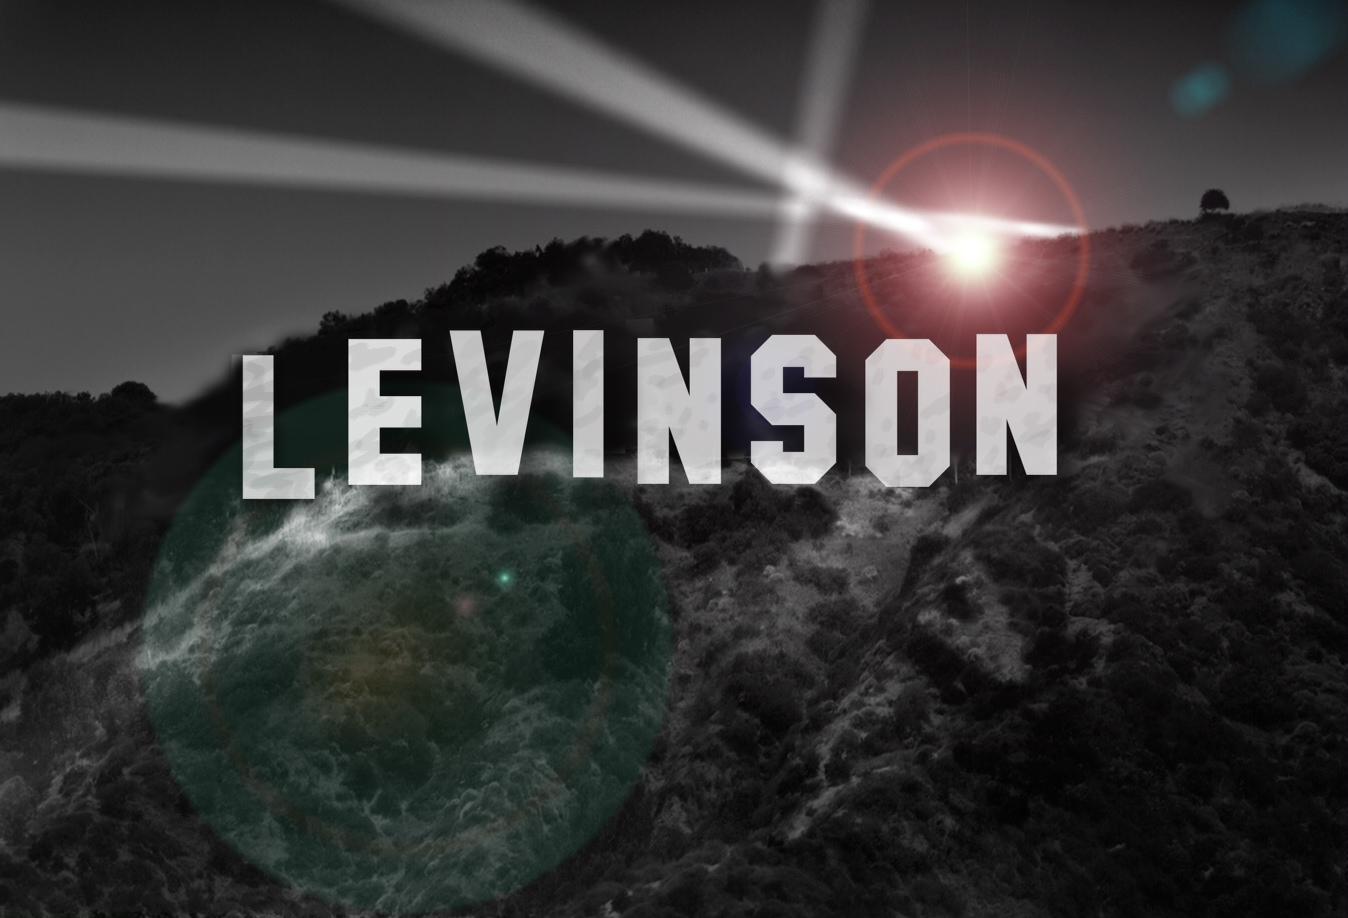 Levinson Hollywood Sign (Photoshop by Tom Salvas)